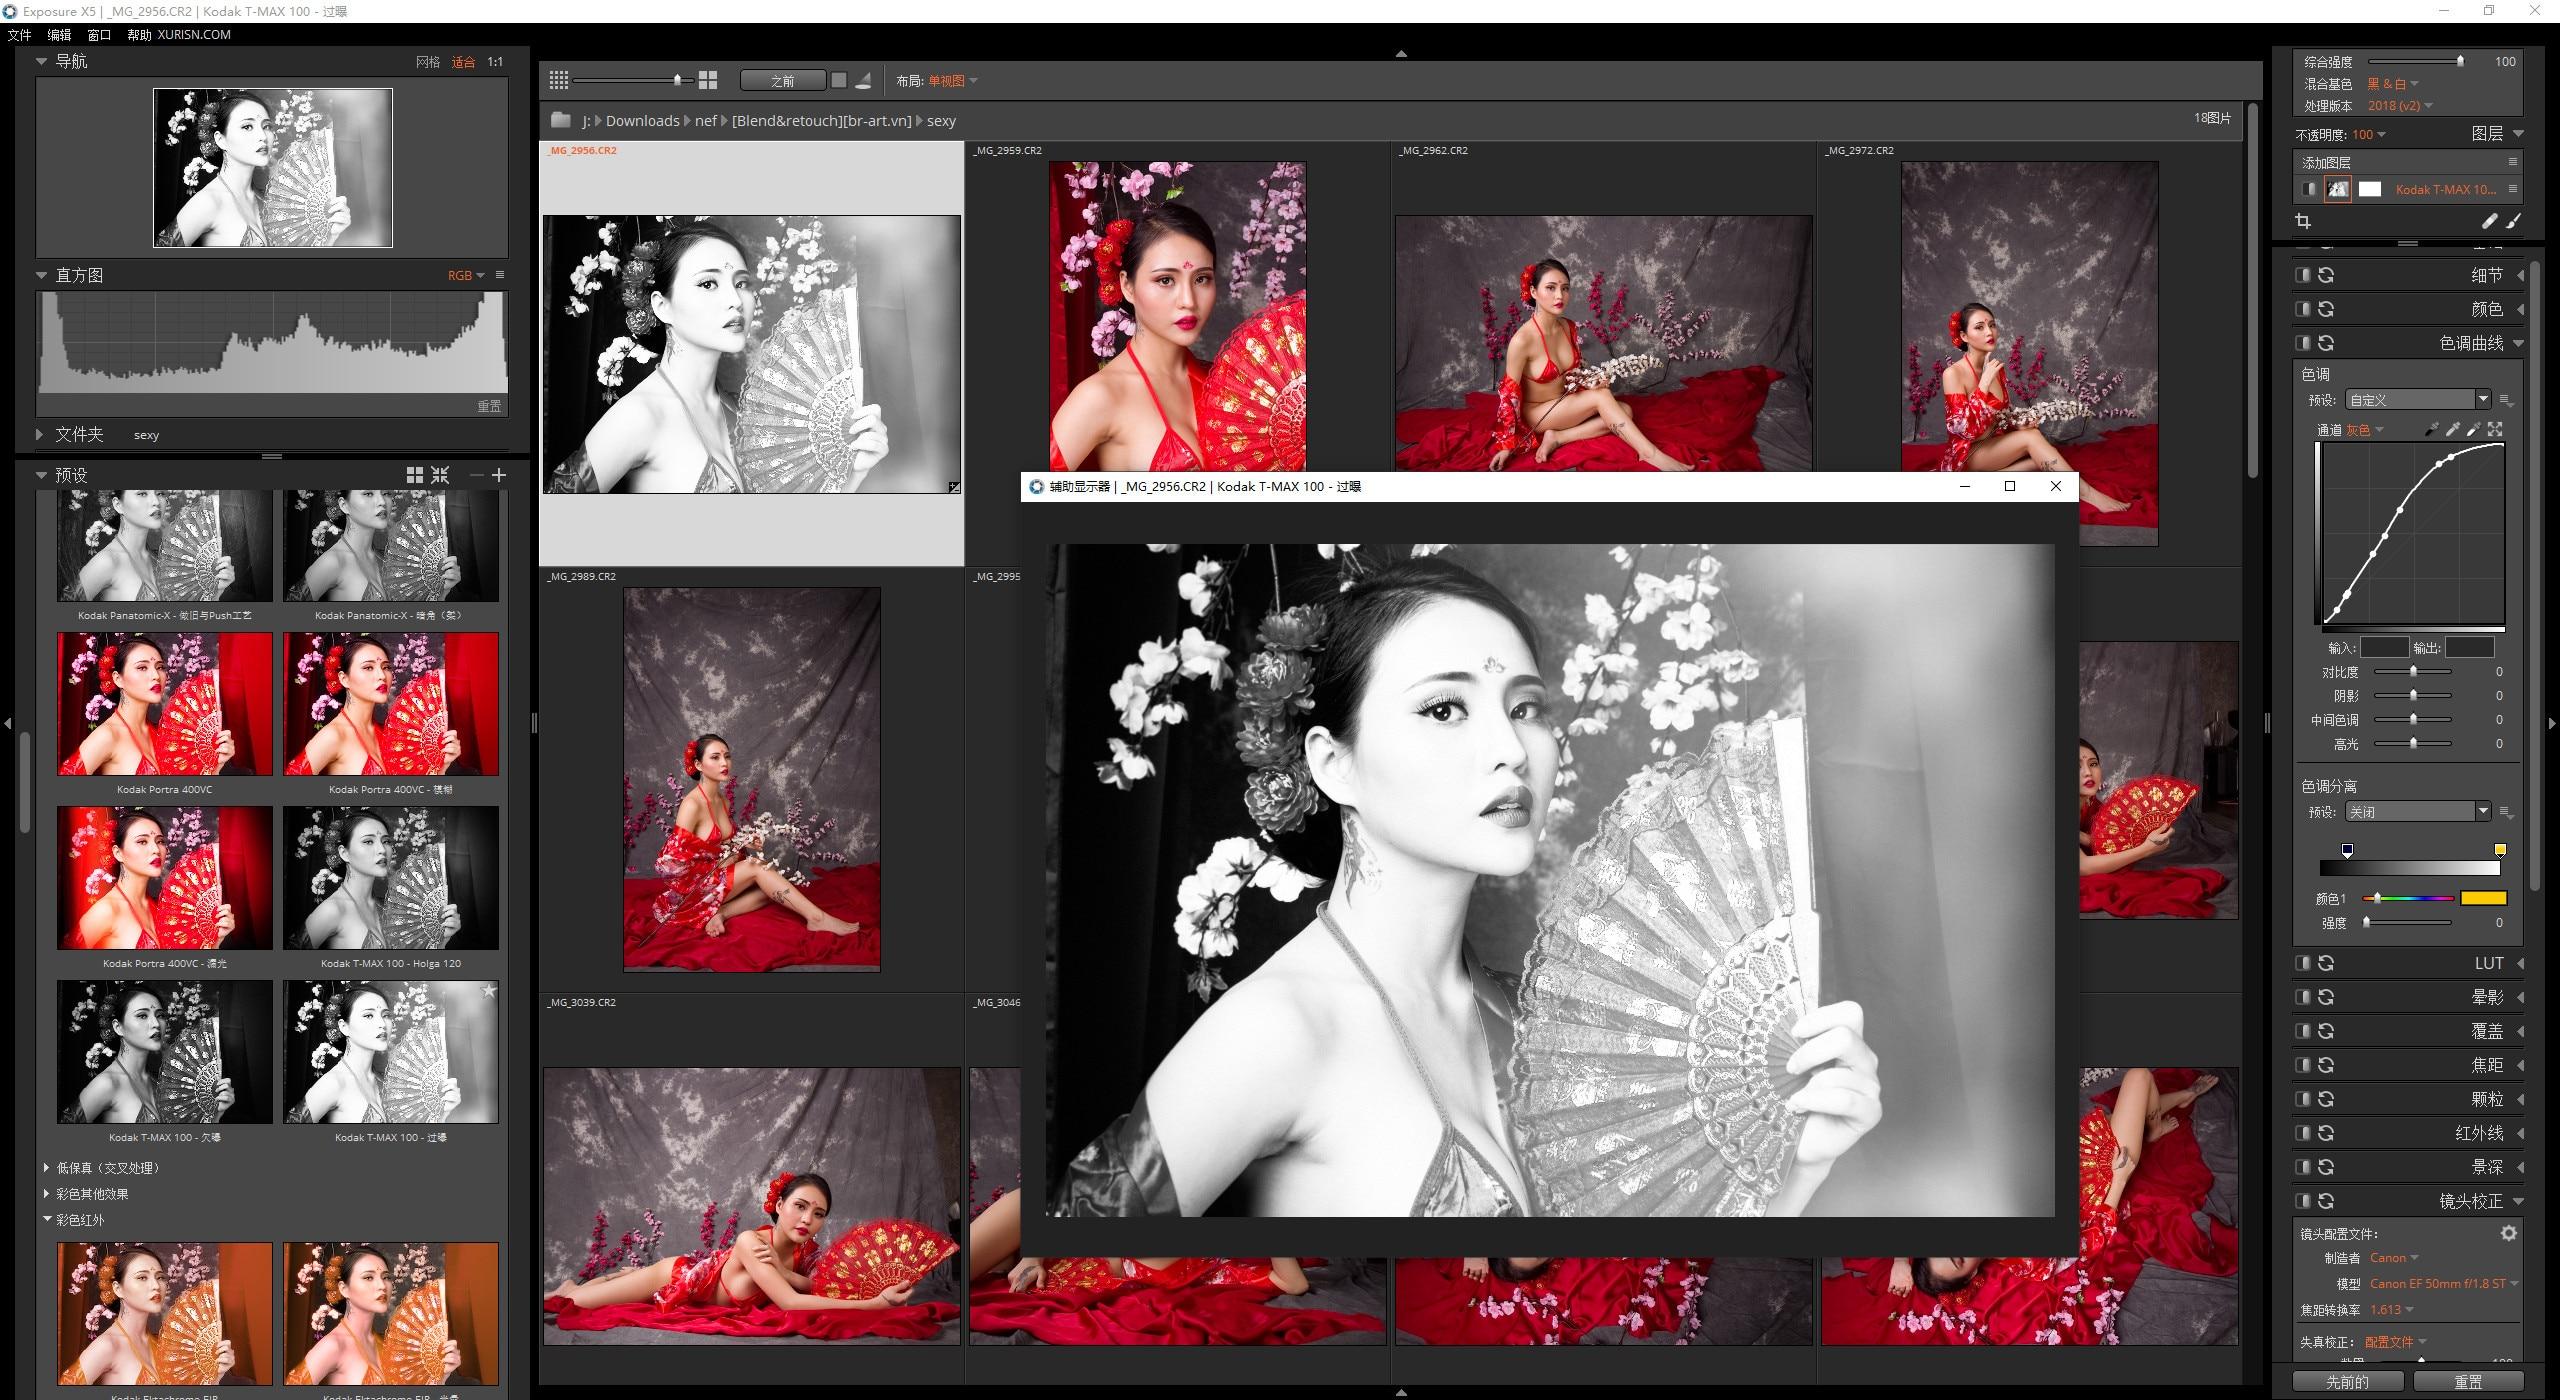 VIP资源-顶级创意摄影照片编辑器Alien Skin Exposure X5 5.2.3.285中文汉化版(1)